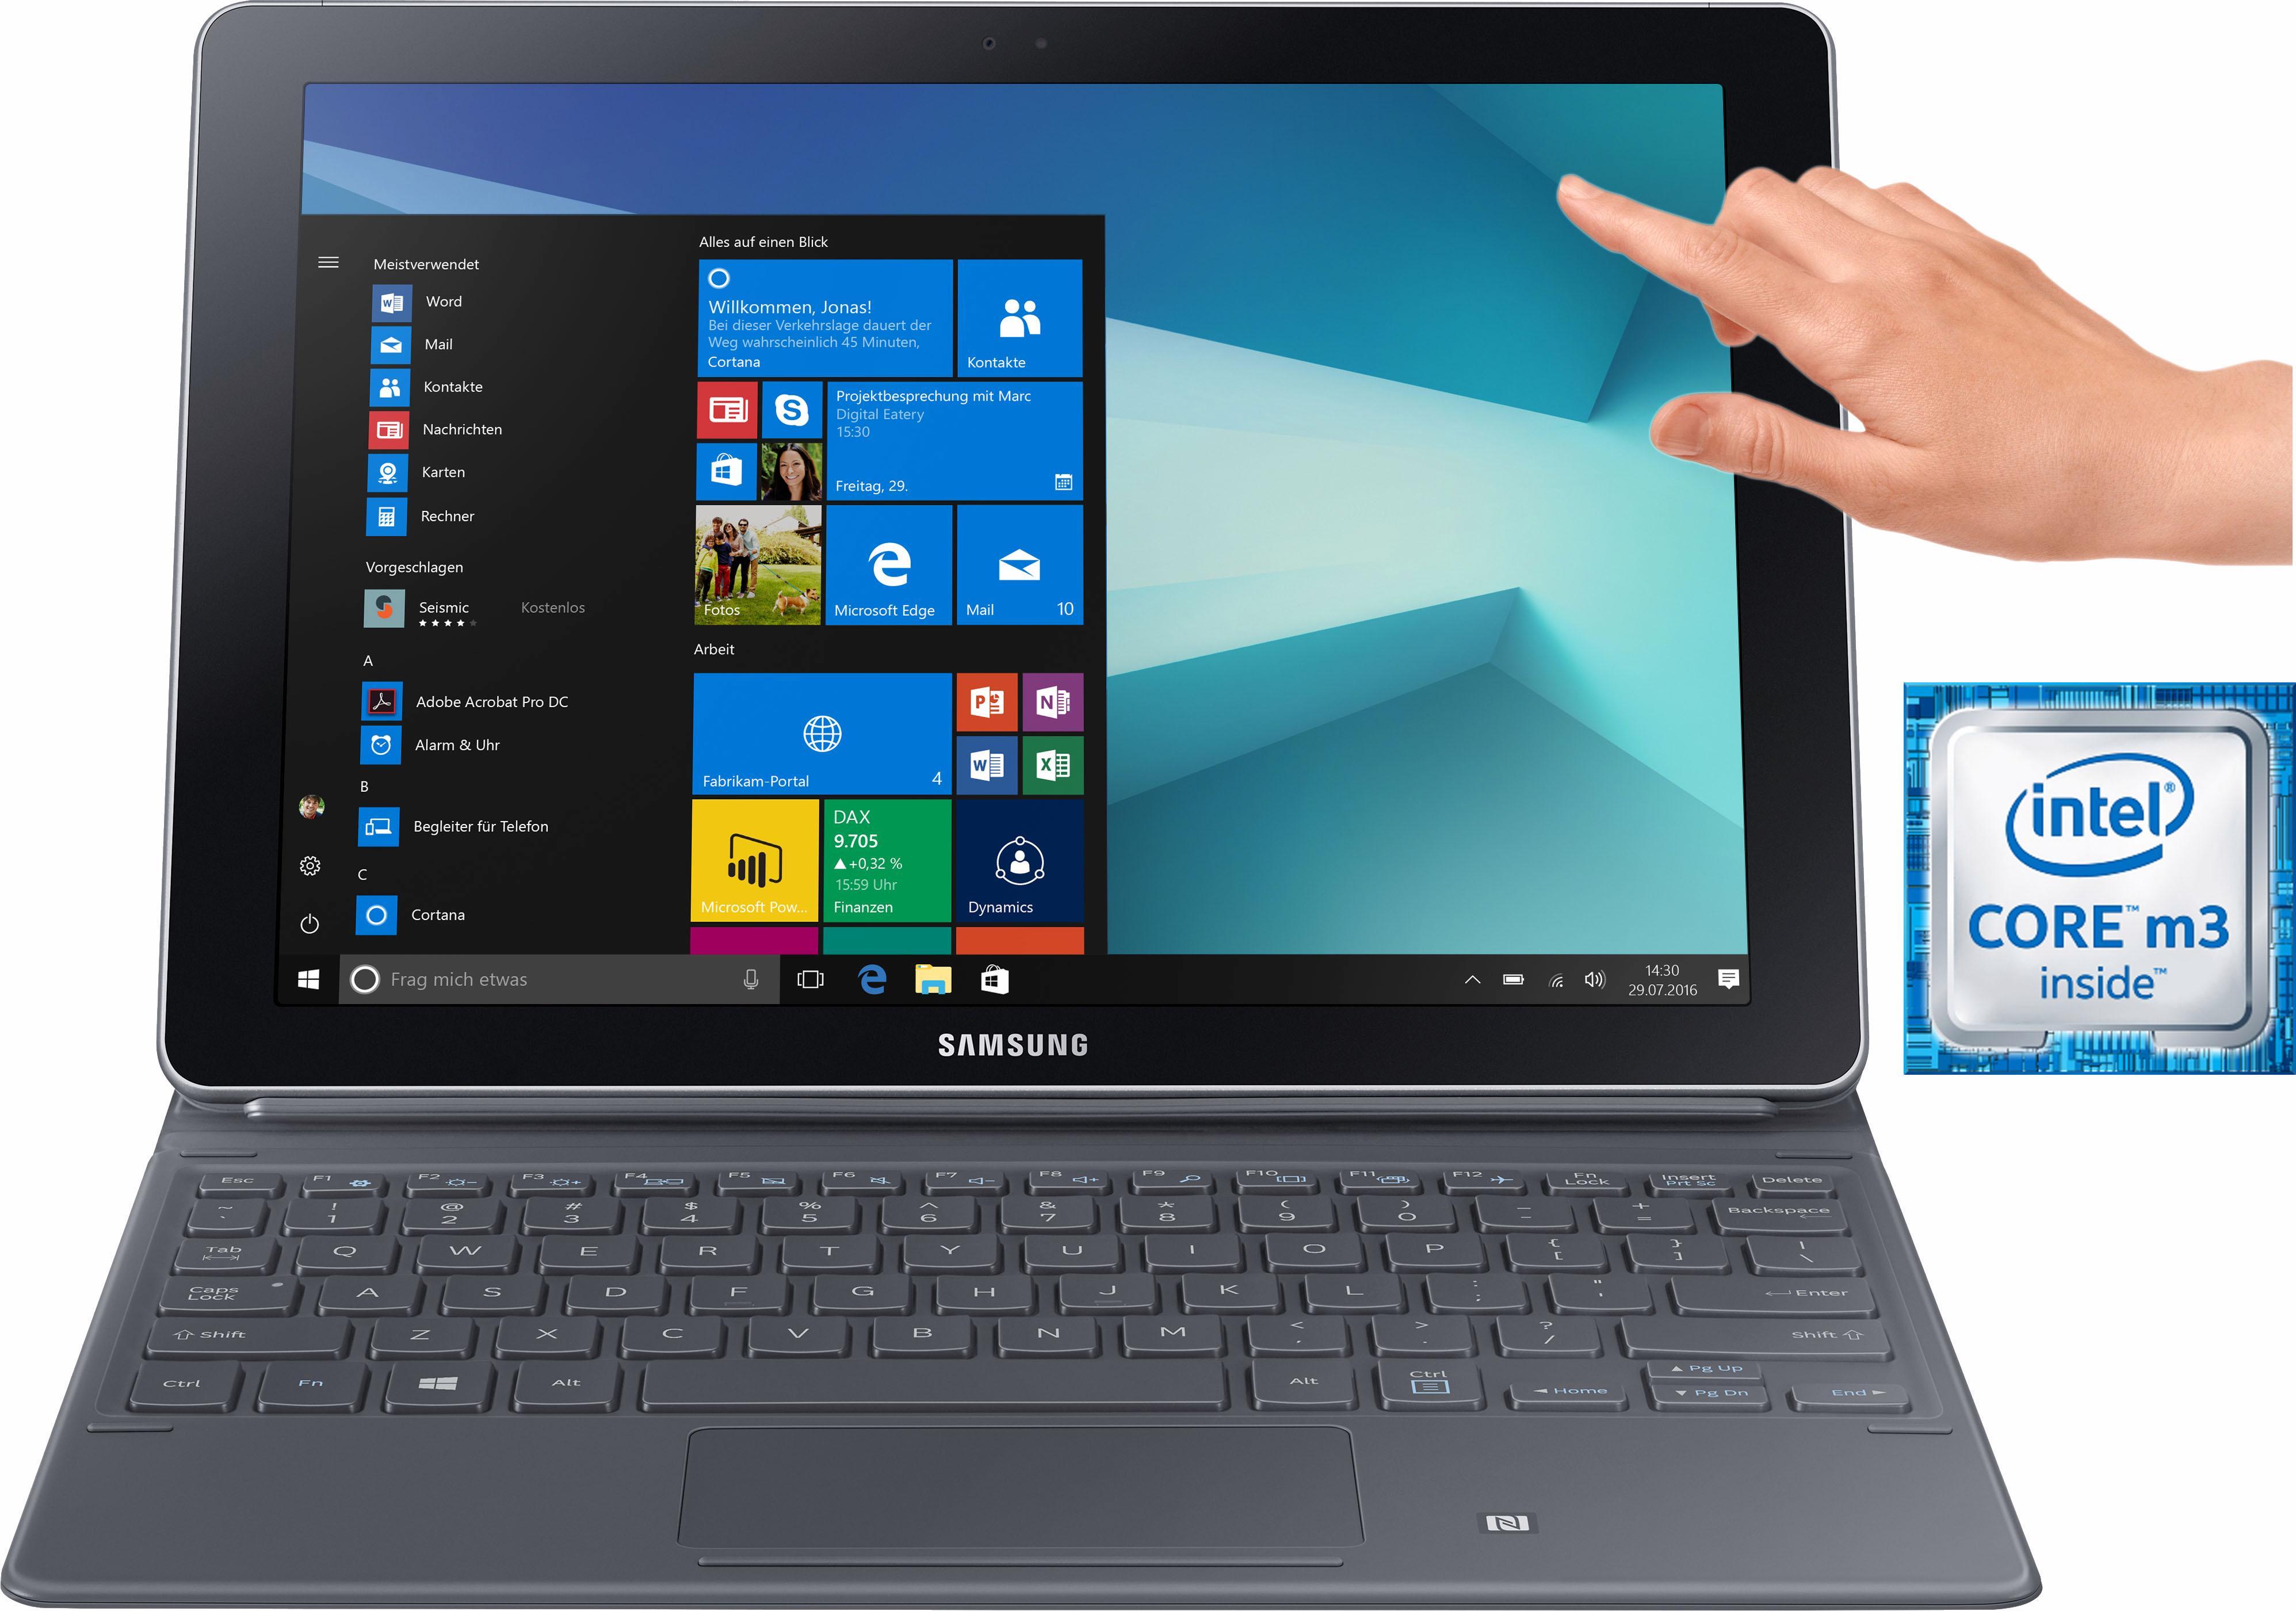 Samsung Galaxy Book 10.6 LTE Convertible Notebook (10,6 Zoll, Intel, Core m3)